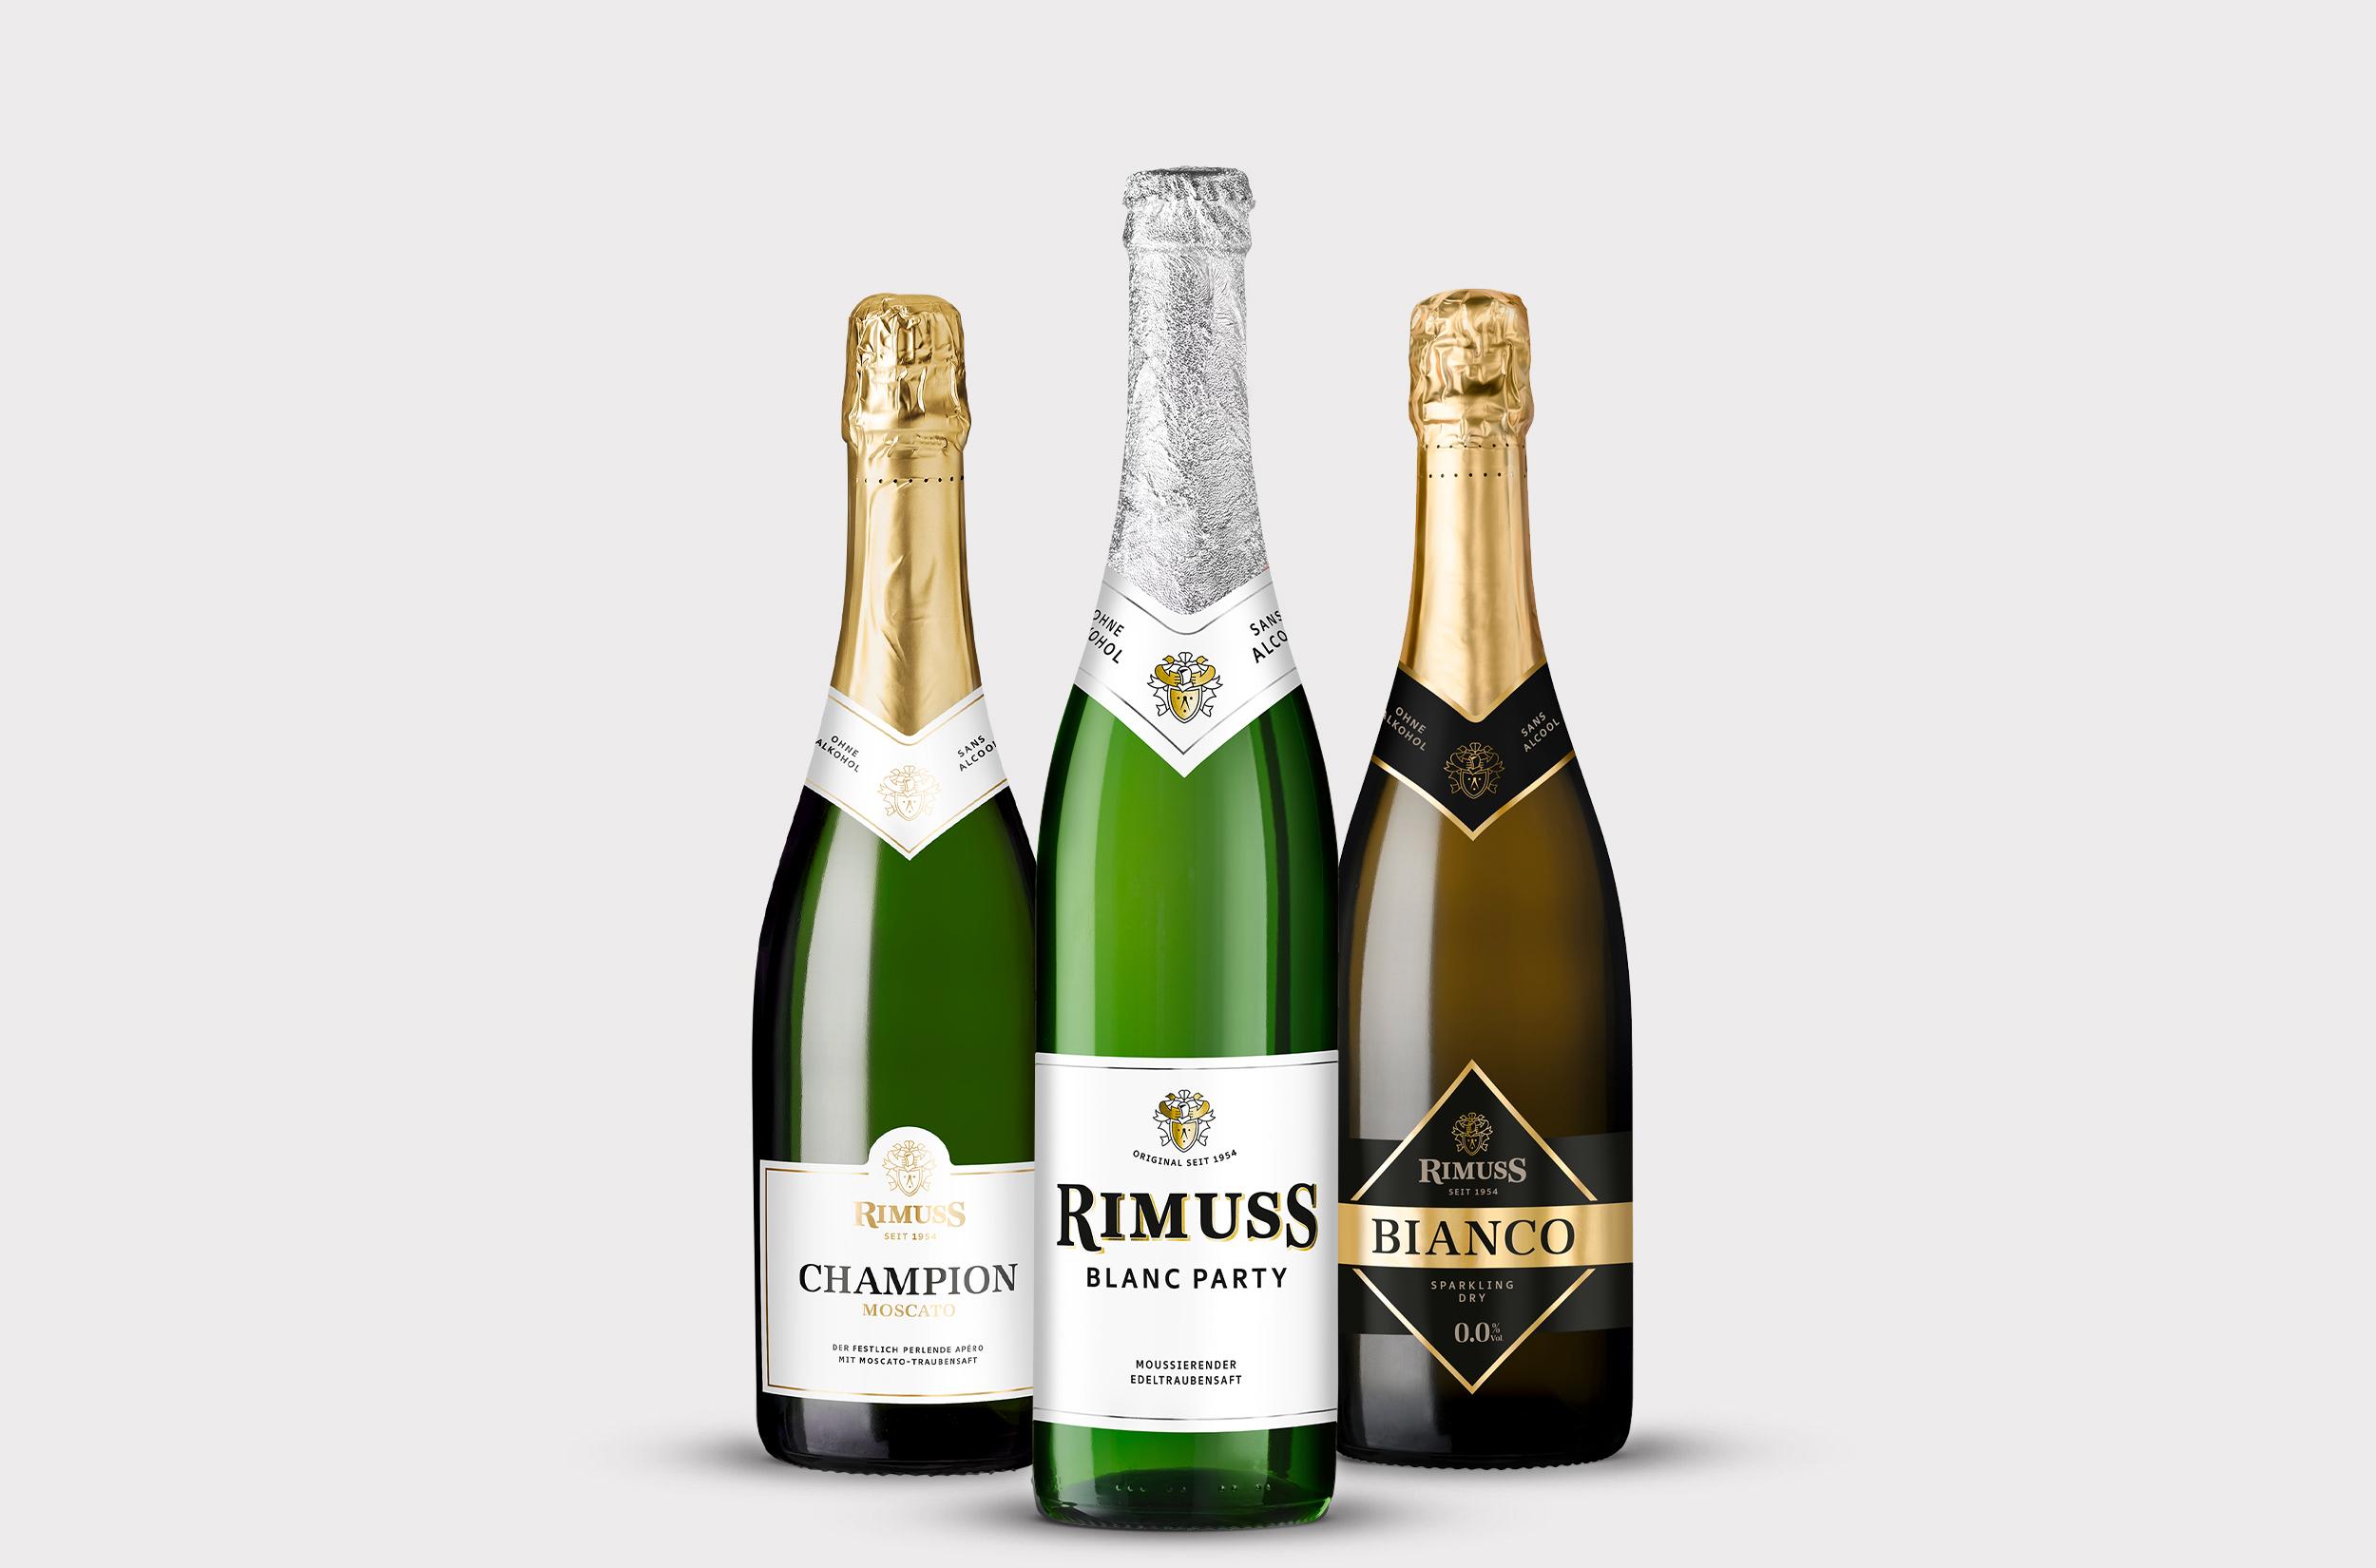 Alles für den Apero seit 1954: Rimuss Champion Moscato, Rimuss Blanc Party, Rimuss Bianco Dry